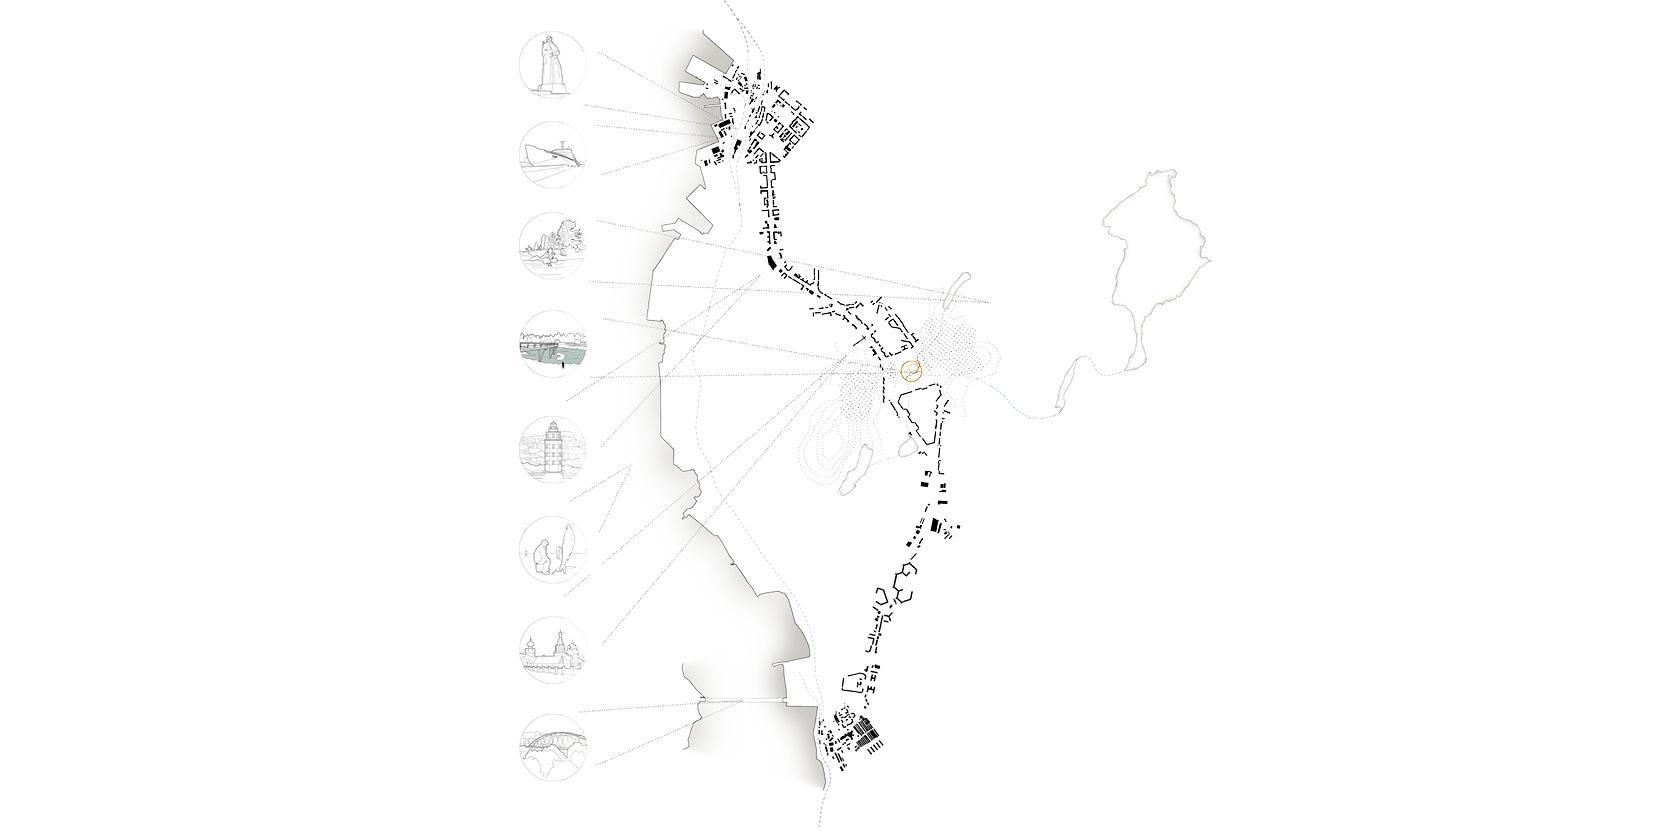 OCA architects Coziness Valley Долина Уюта competition Murmansk region Hernan Lleida Ruiz Bernardo Garcia Morales Miquel Perez Eric Moya13